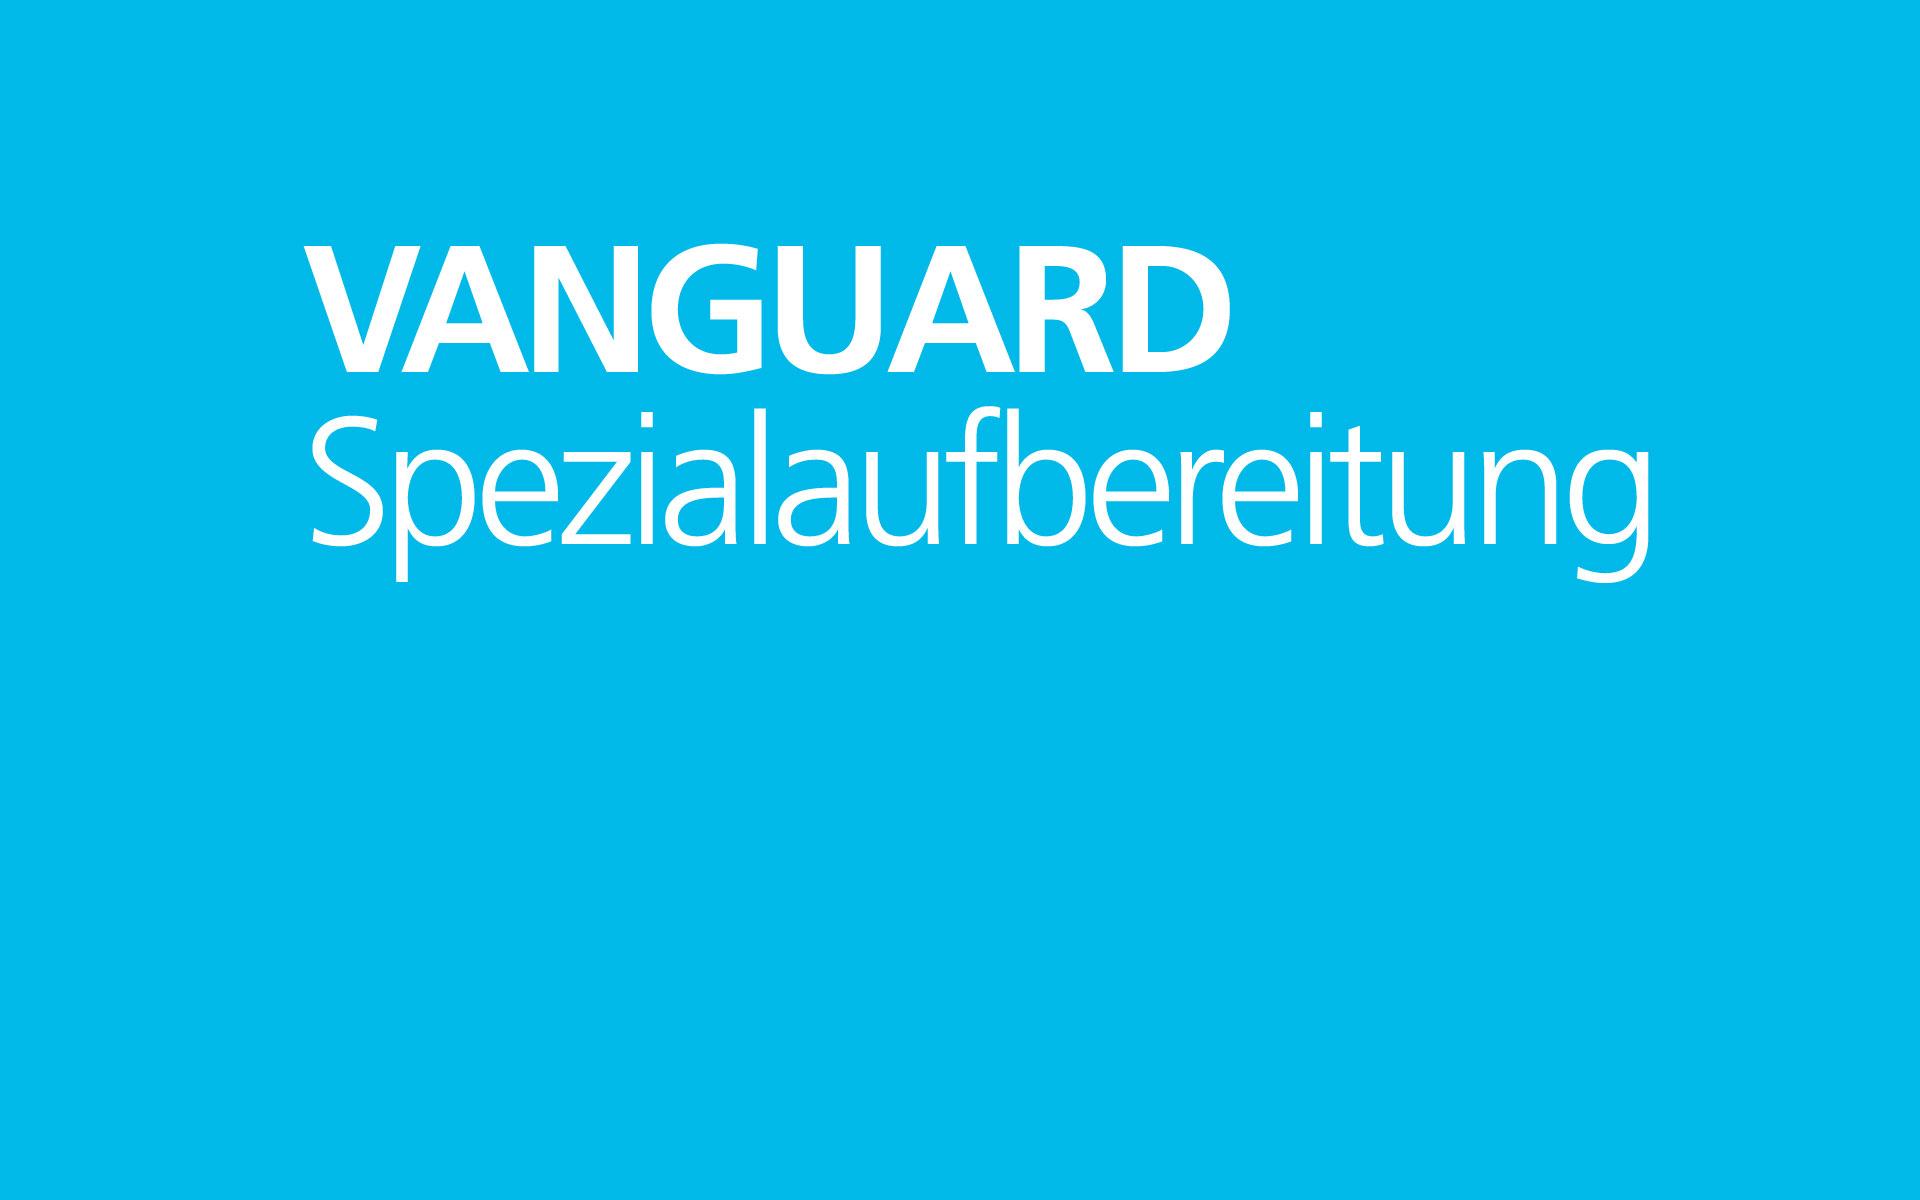 VANGUARD – Spezialaufbereitung